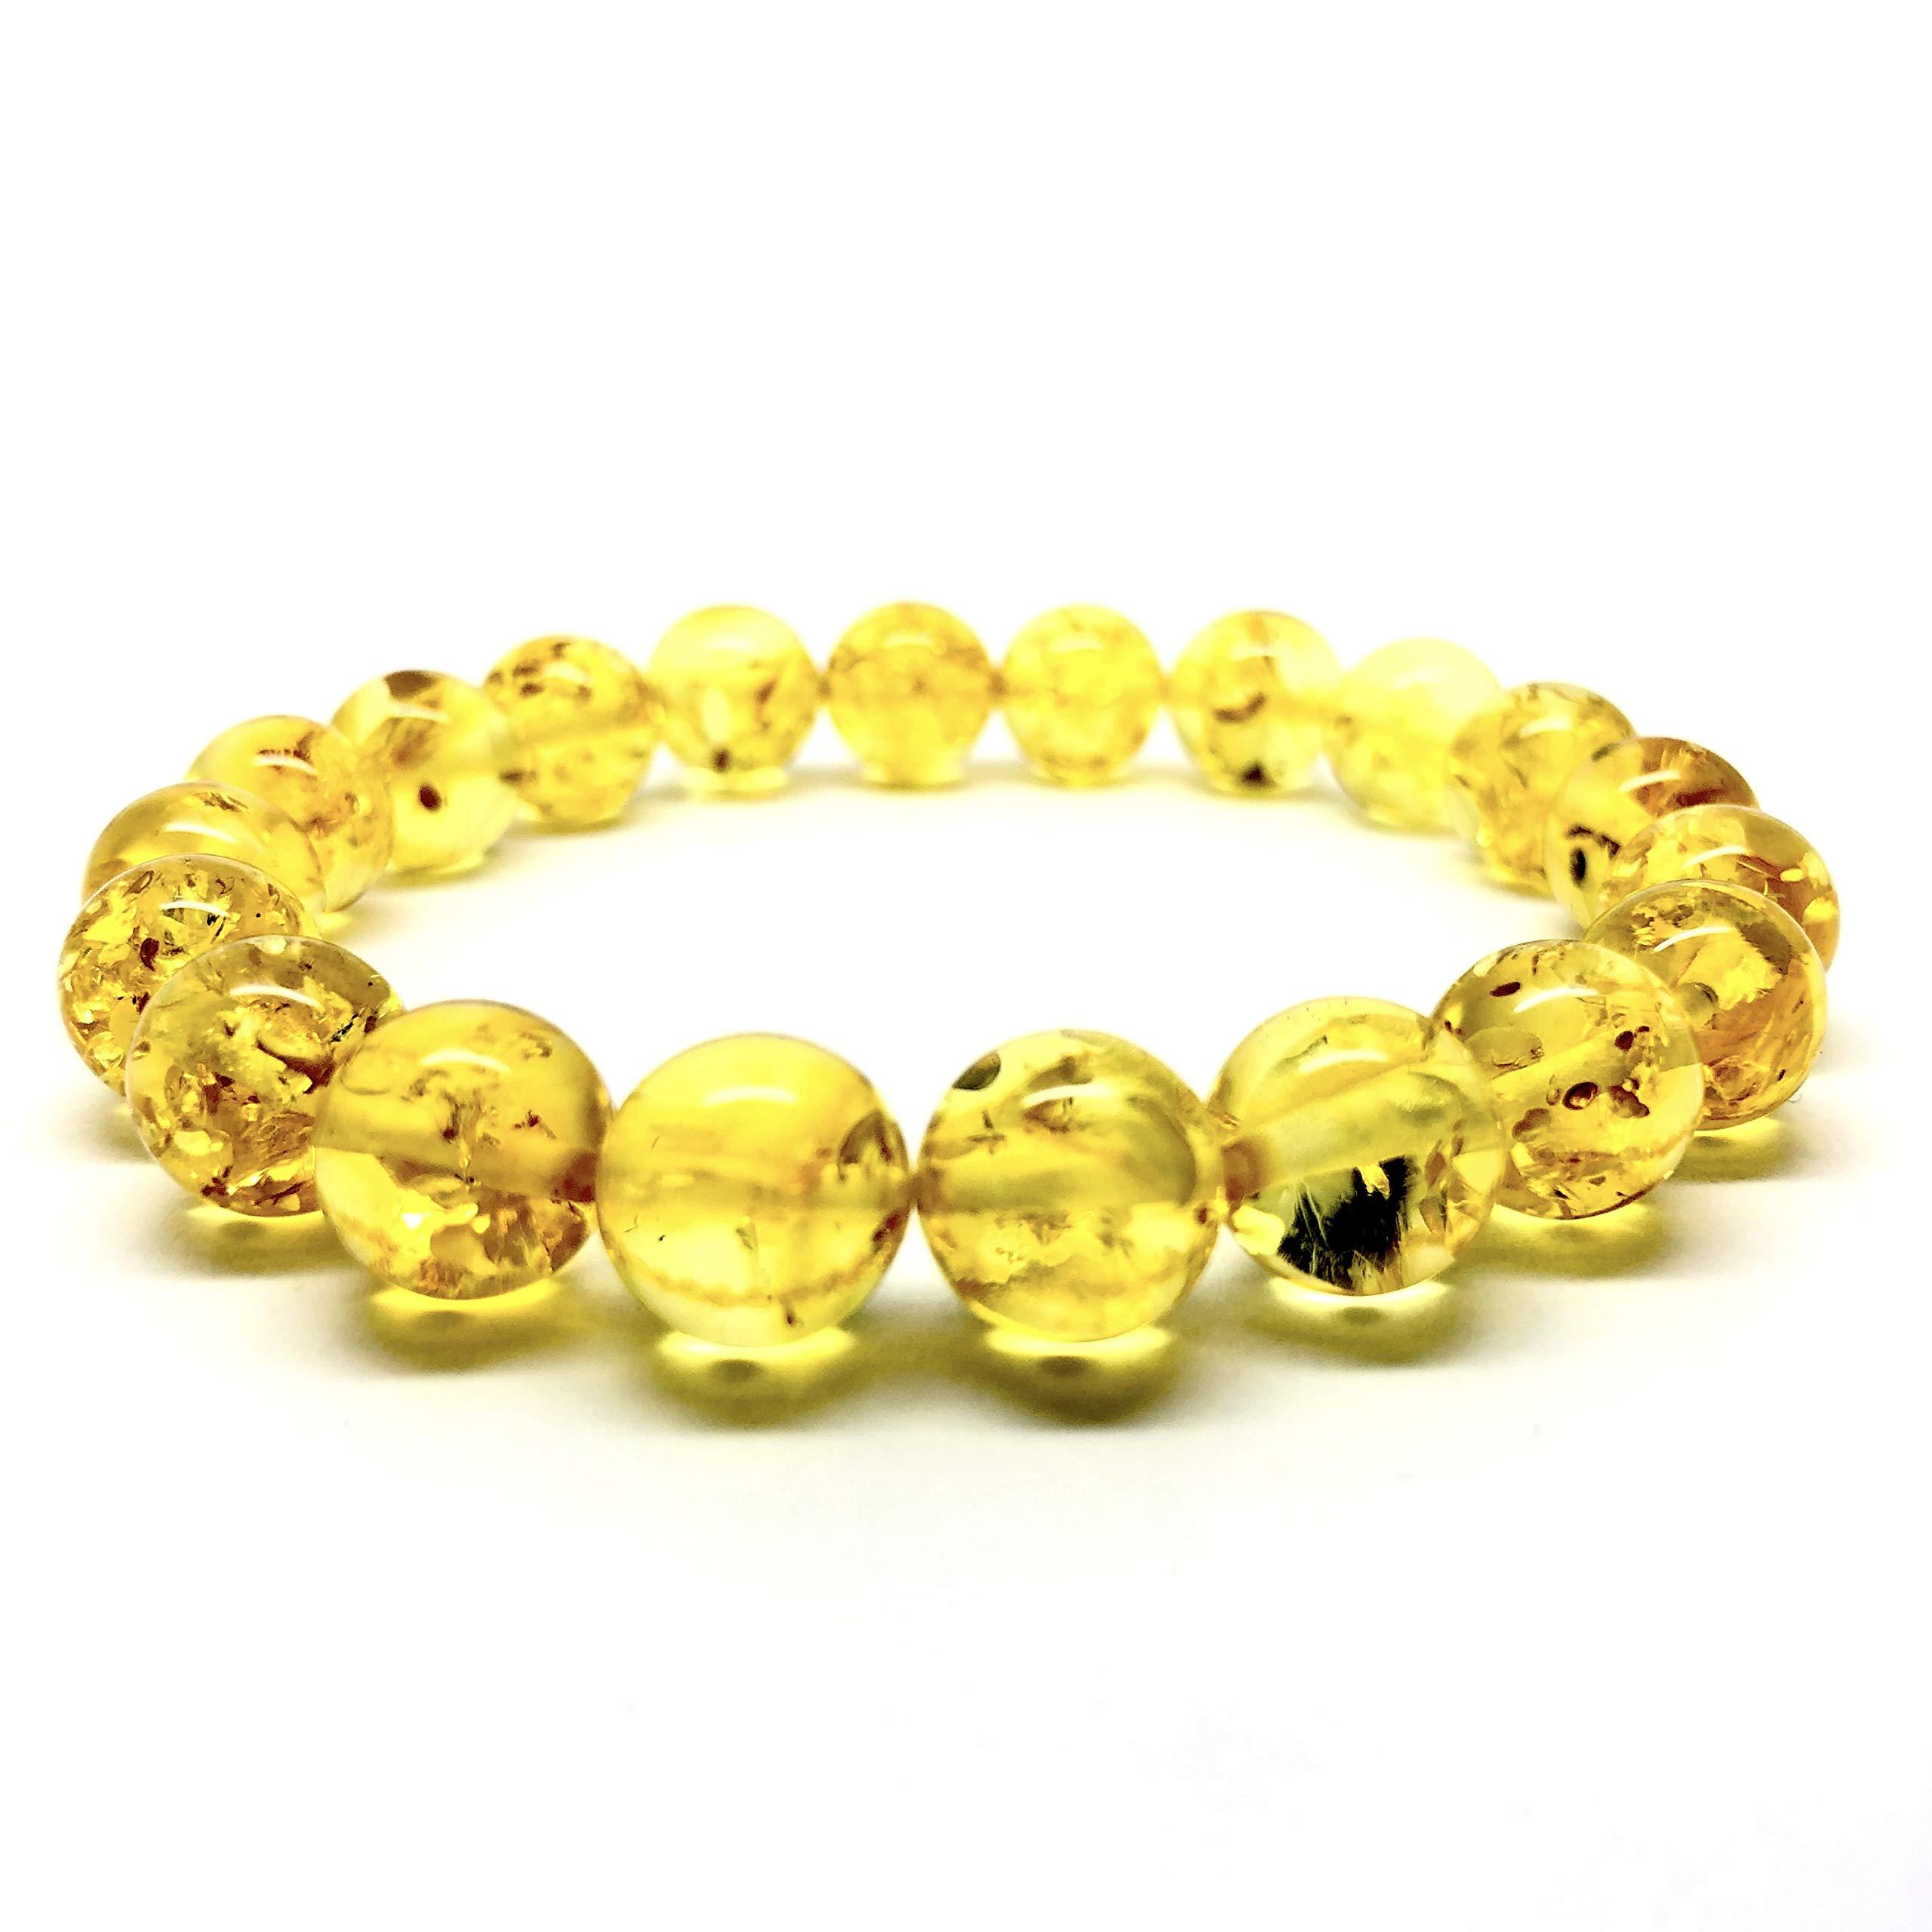 Natural Baltic Amber Bracelet Sparkling Lemon Colour ±11,5g 10± mm Size.